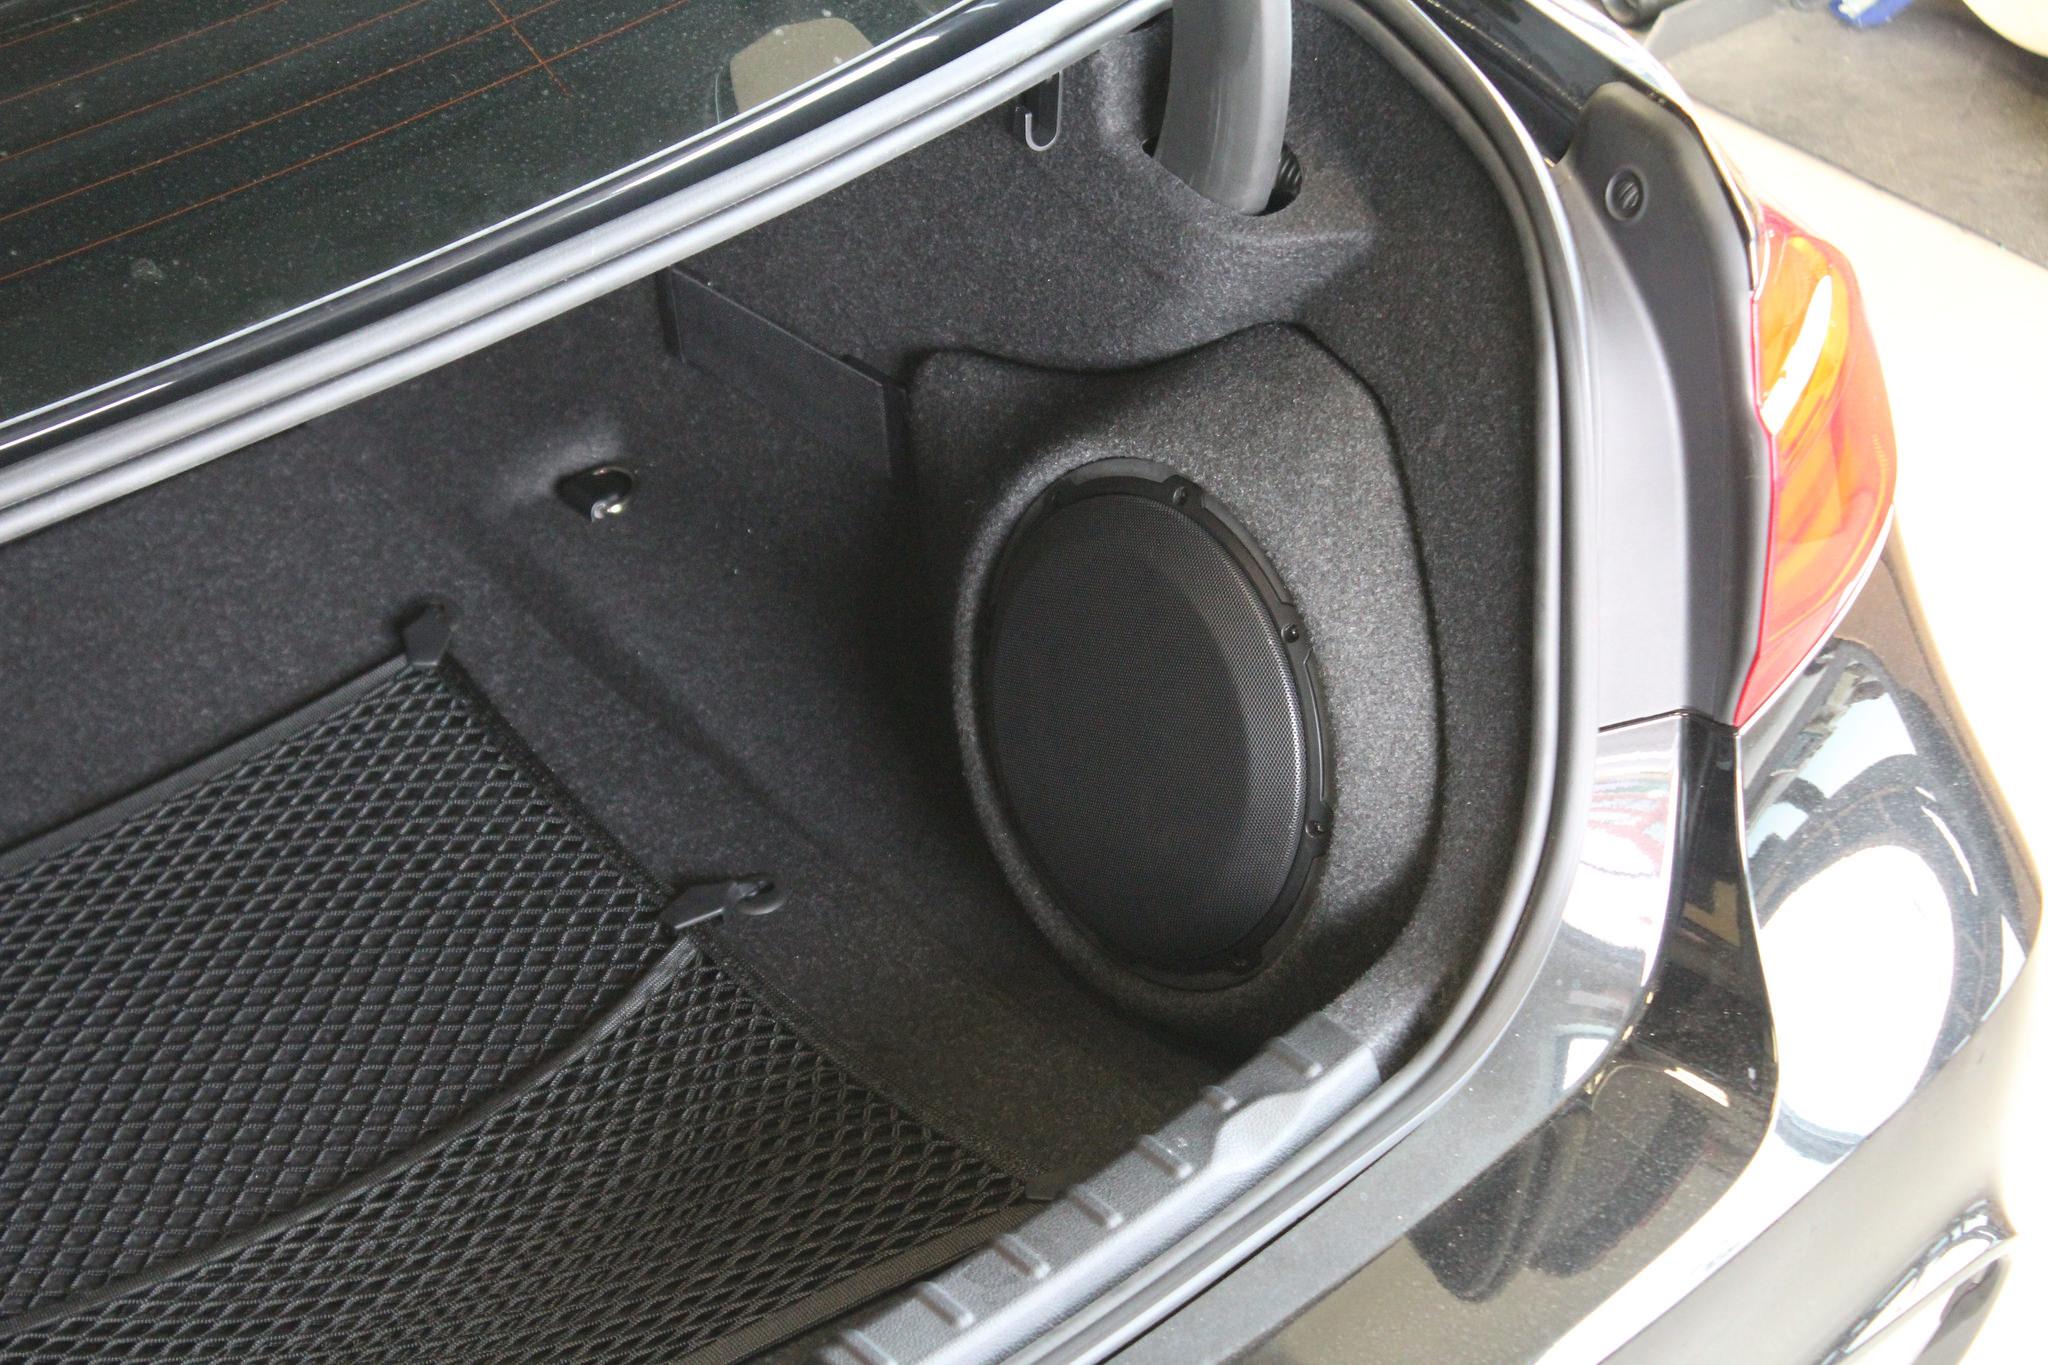 Velodyne Subwoofer Wiring Diagram Explained Diagrams Jl Audio W3 Scion Xb Enclosure Ultra Auto Sound Page Crutchfield